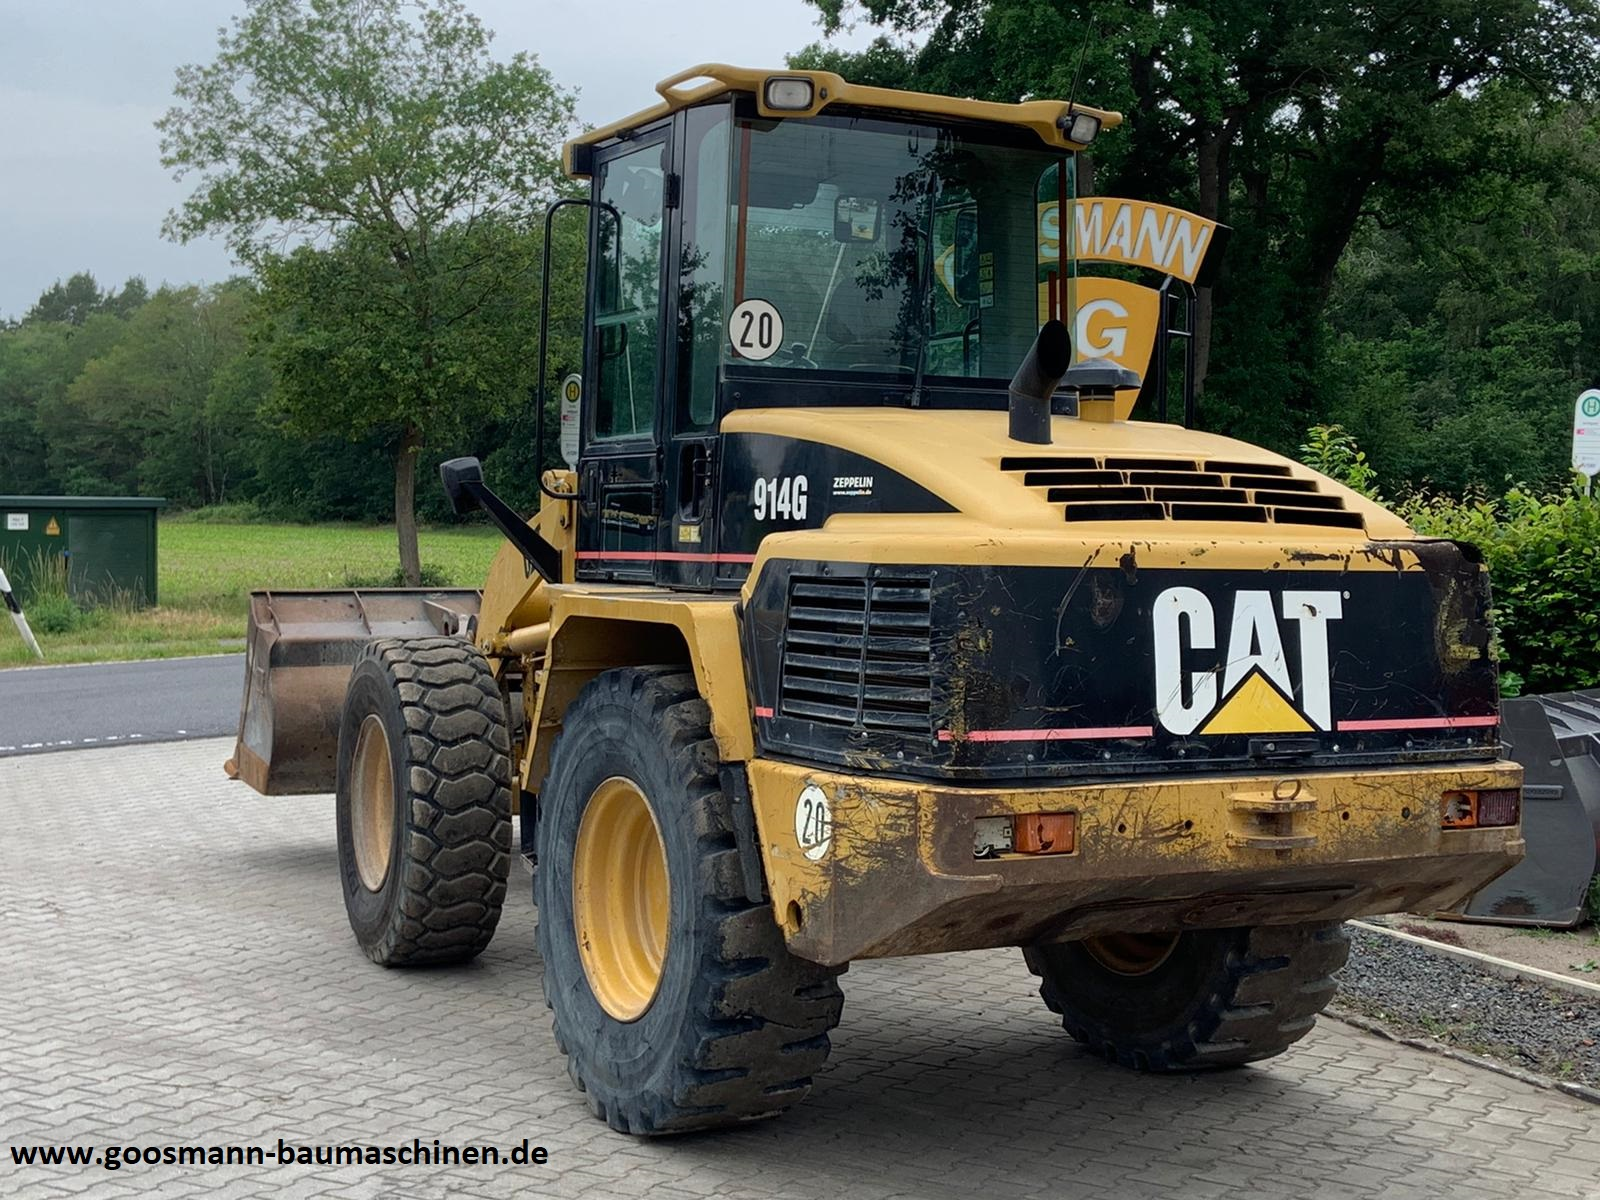 2006-caterpillar-914g-equipment-cover-image